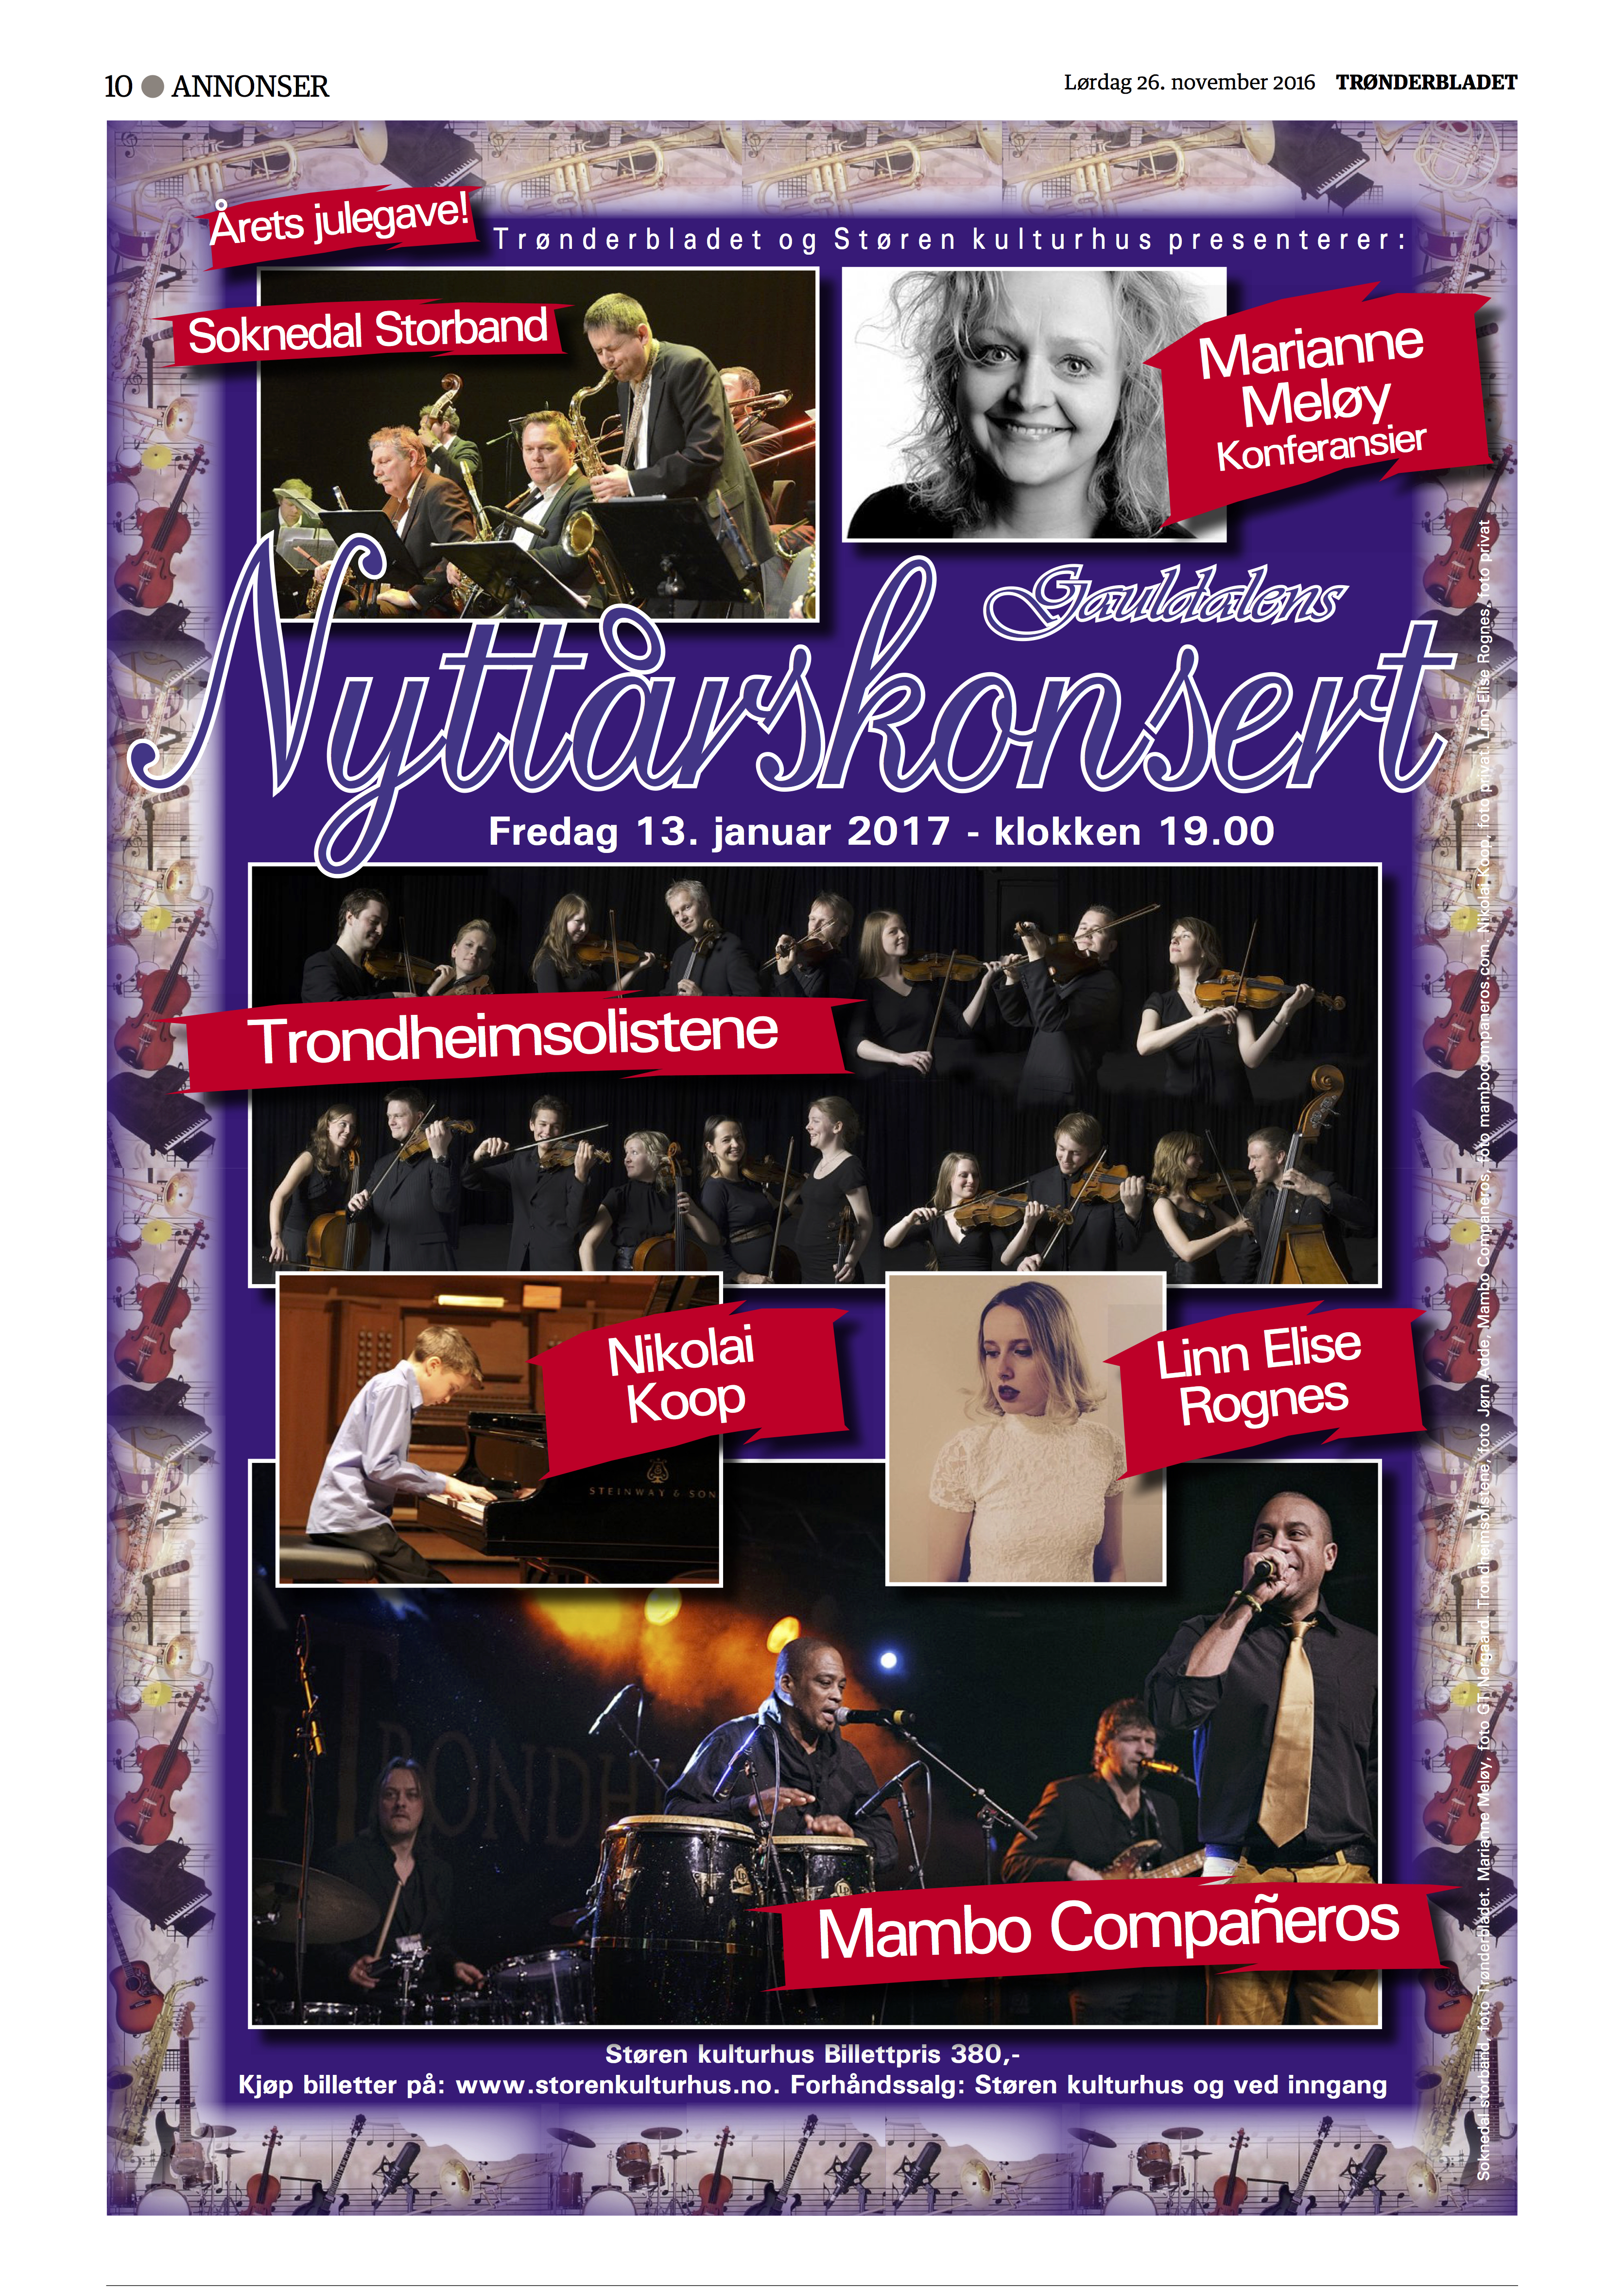 tronderbladet-2016-11-26-side-10